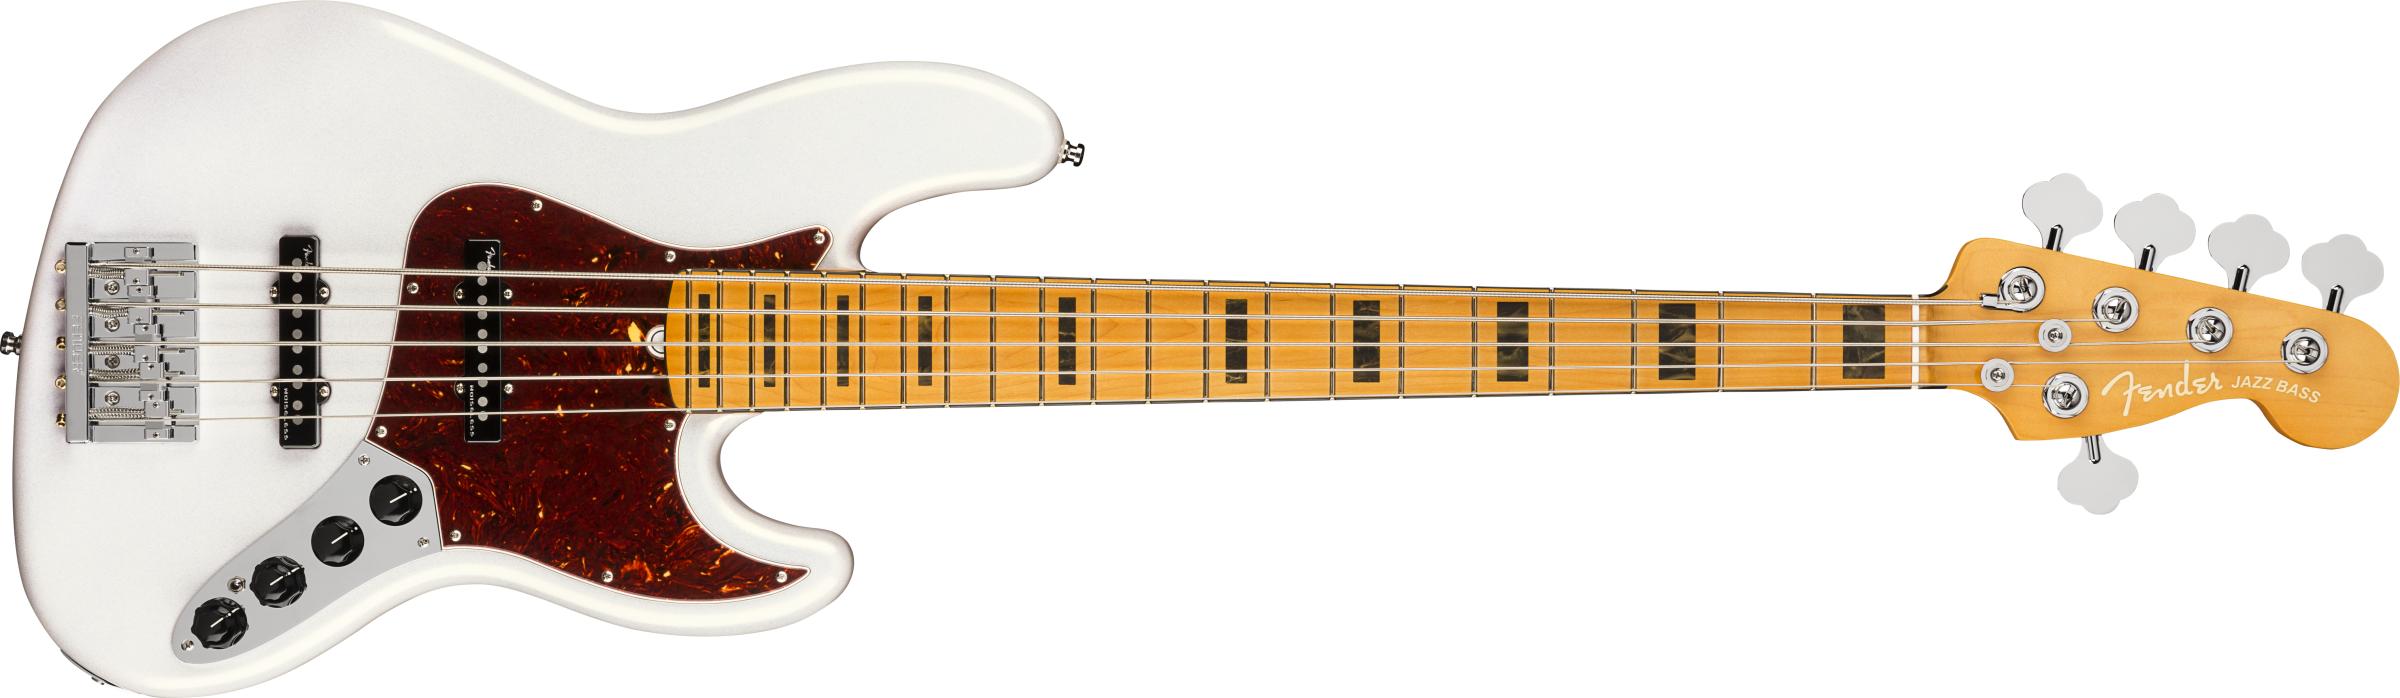 FENDER-American-Ultra-Jazz-Bass-V-Maple-Fingerboard-Arctic-Pearl-sku-571003989